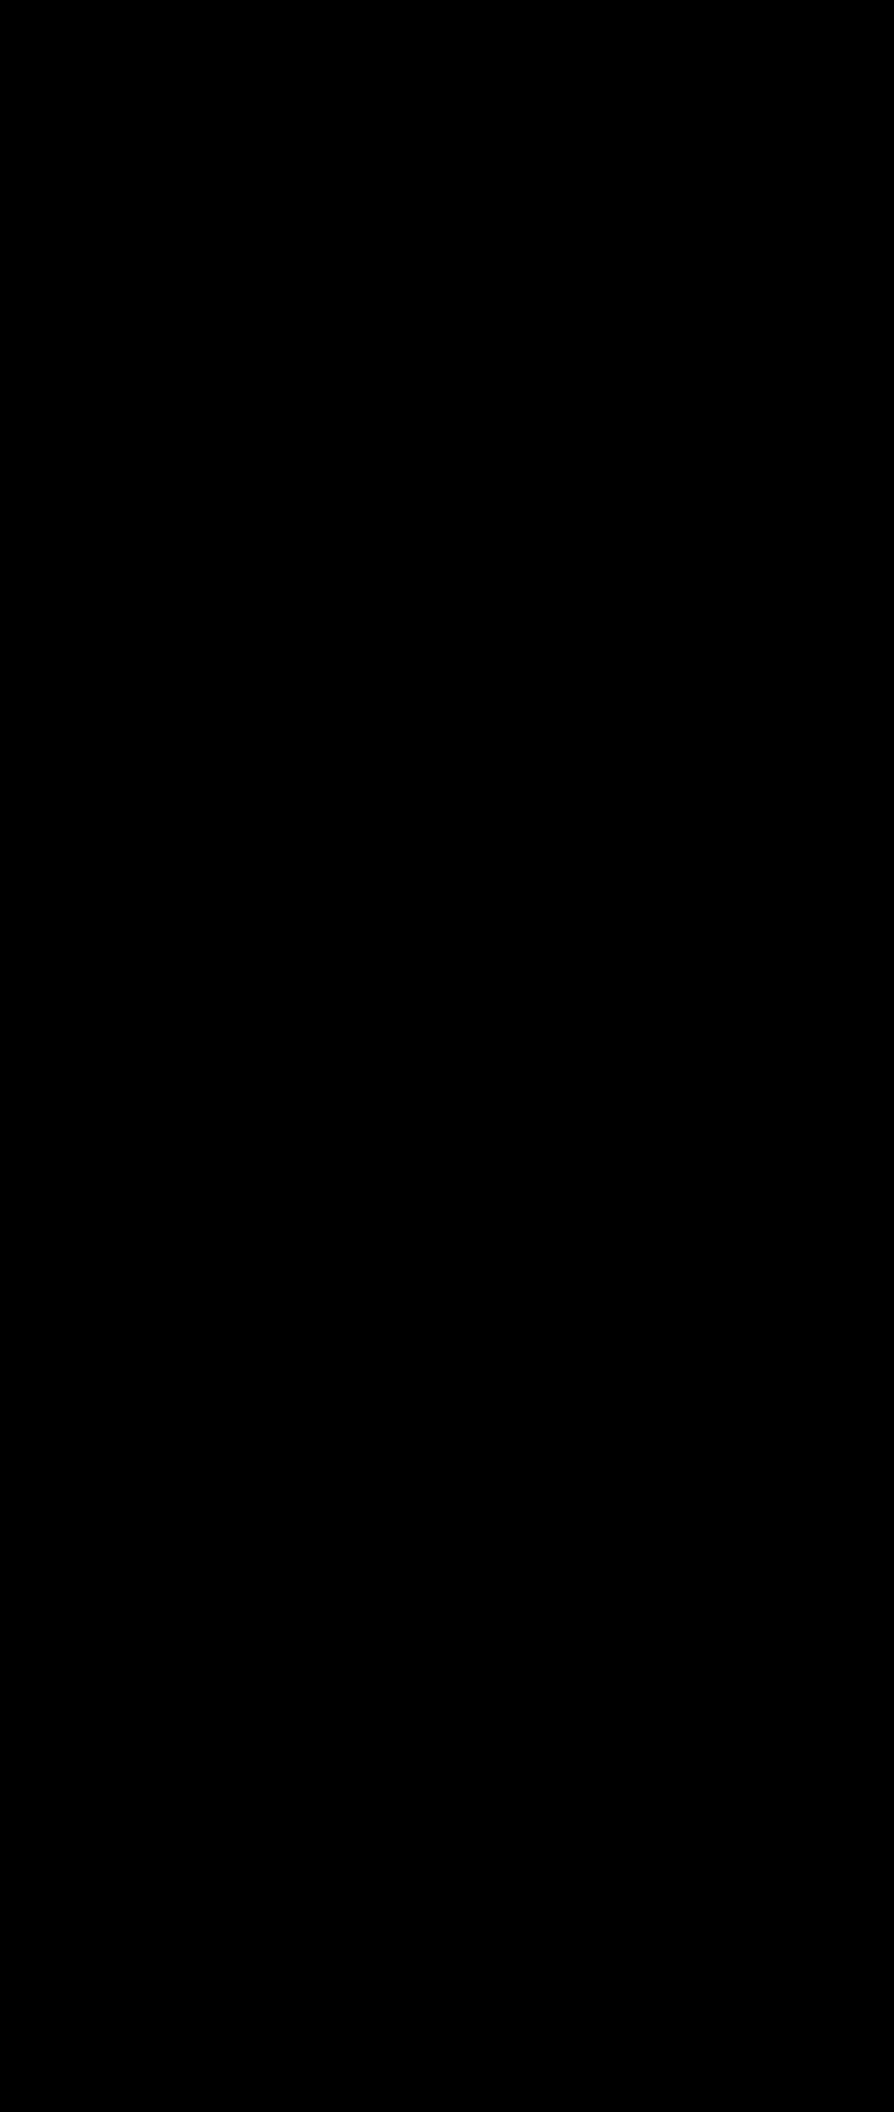 body silhouette clip art at getdrawings com